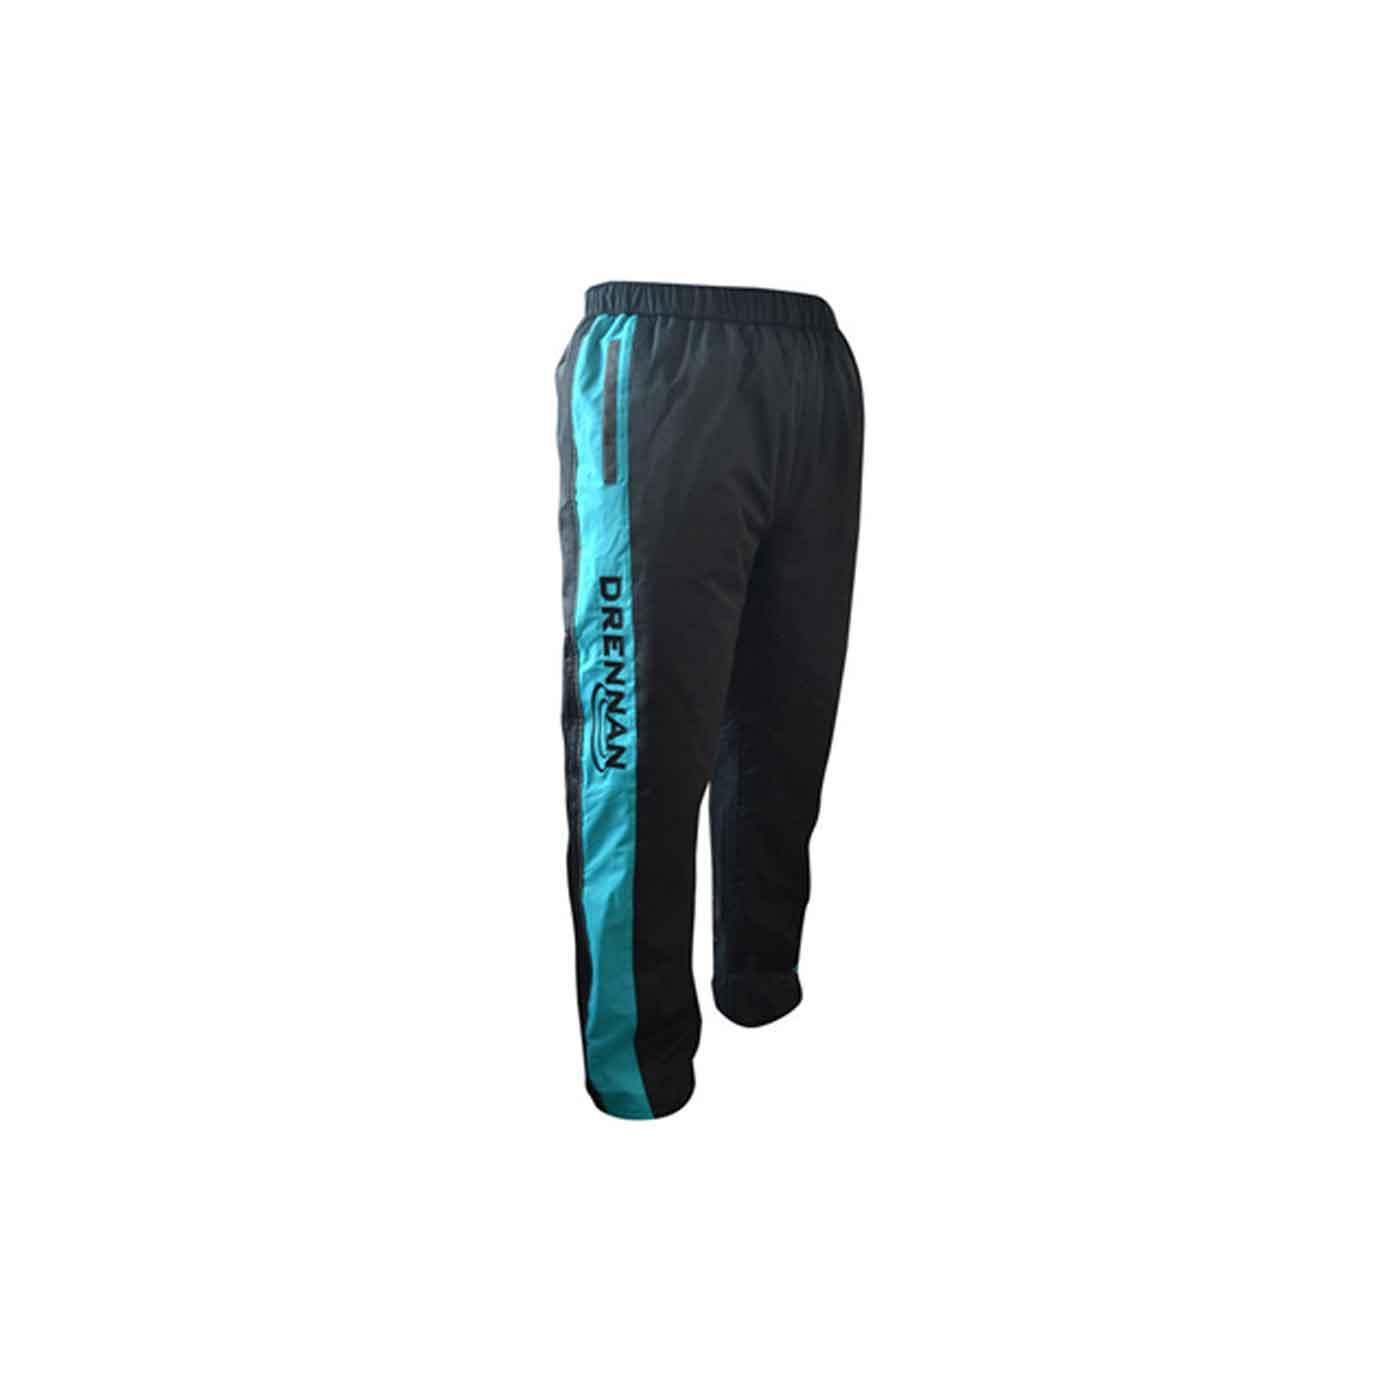 Drennan Quilted Waterproof Trousers